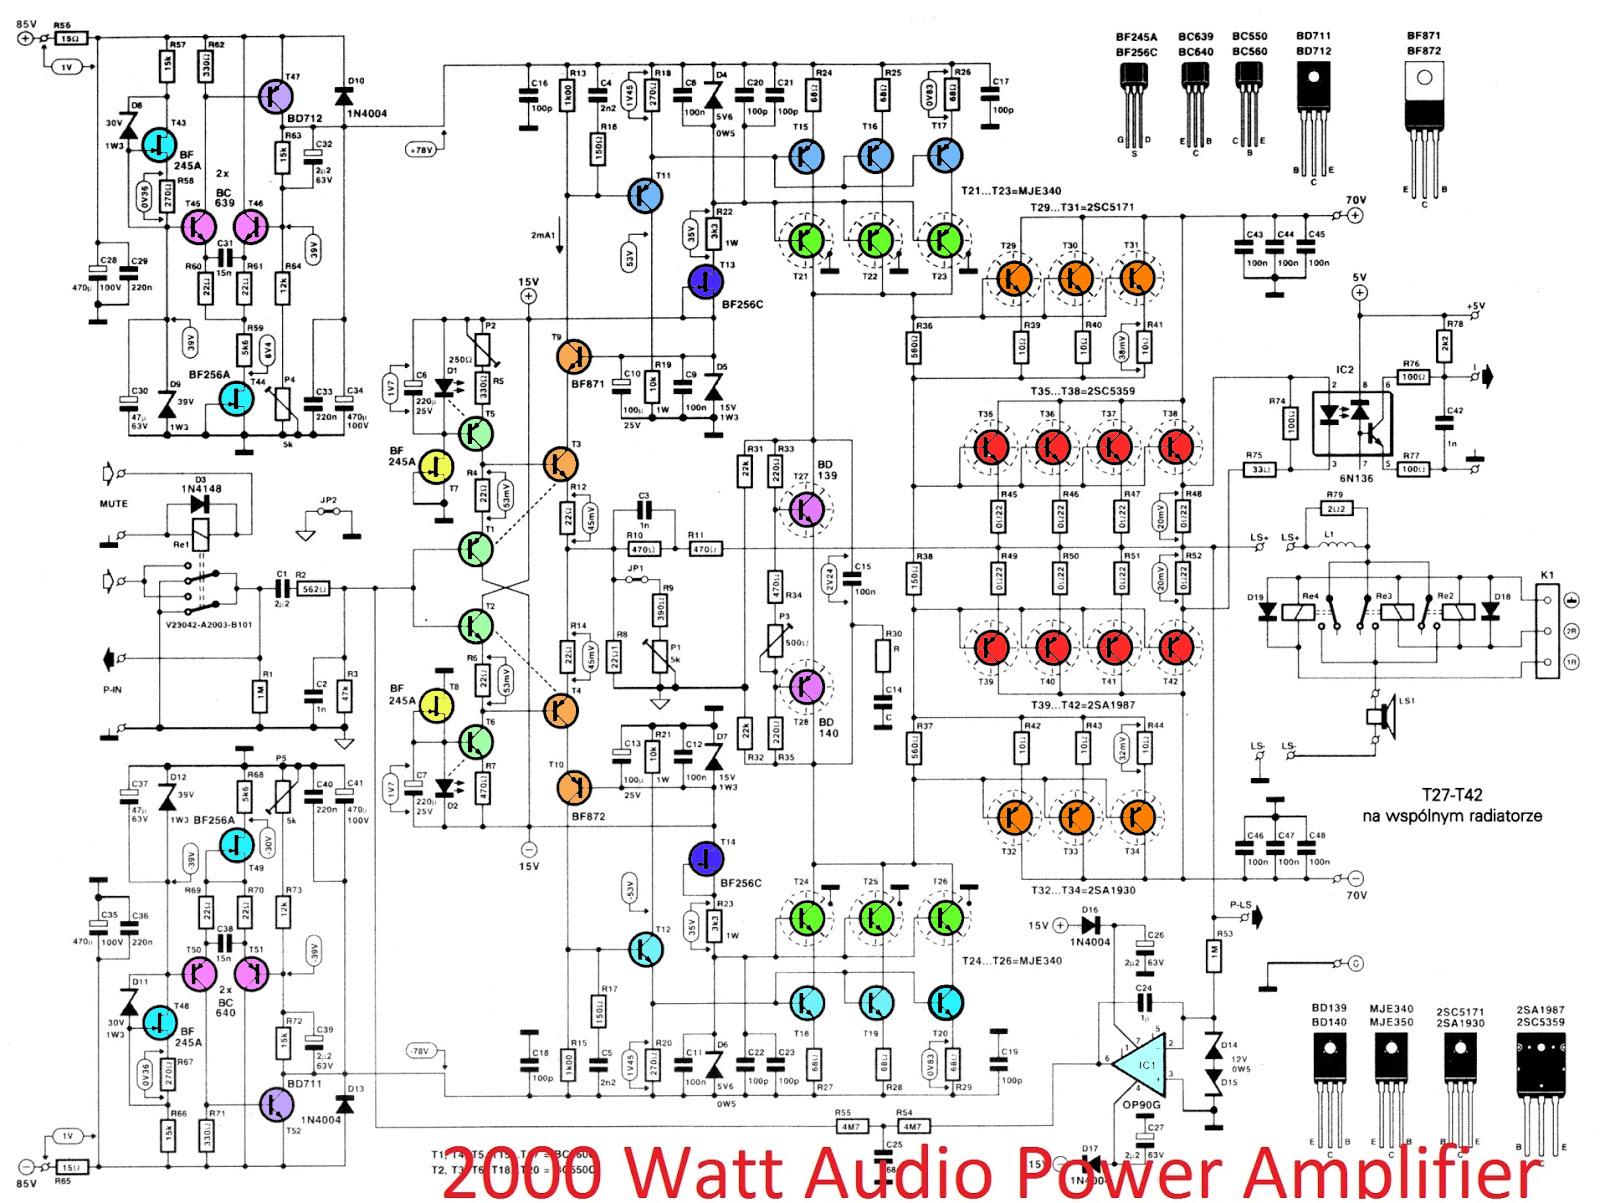 Circuit Diagram Of If Amplifier Diy 30 Watt Stereo Gadgetronicx 2000w High Power 2sc5359 2sa1987 Electronic